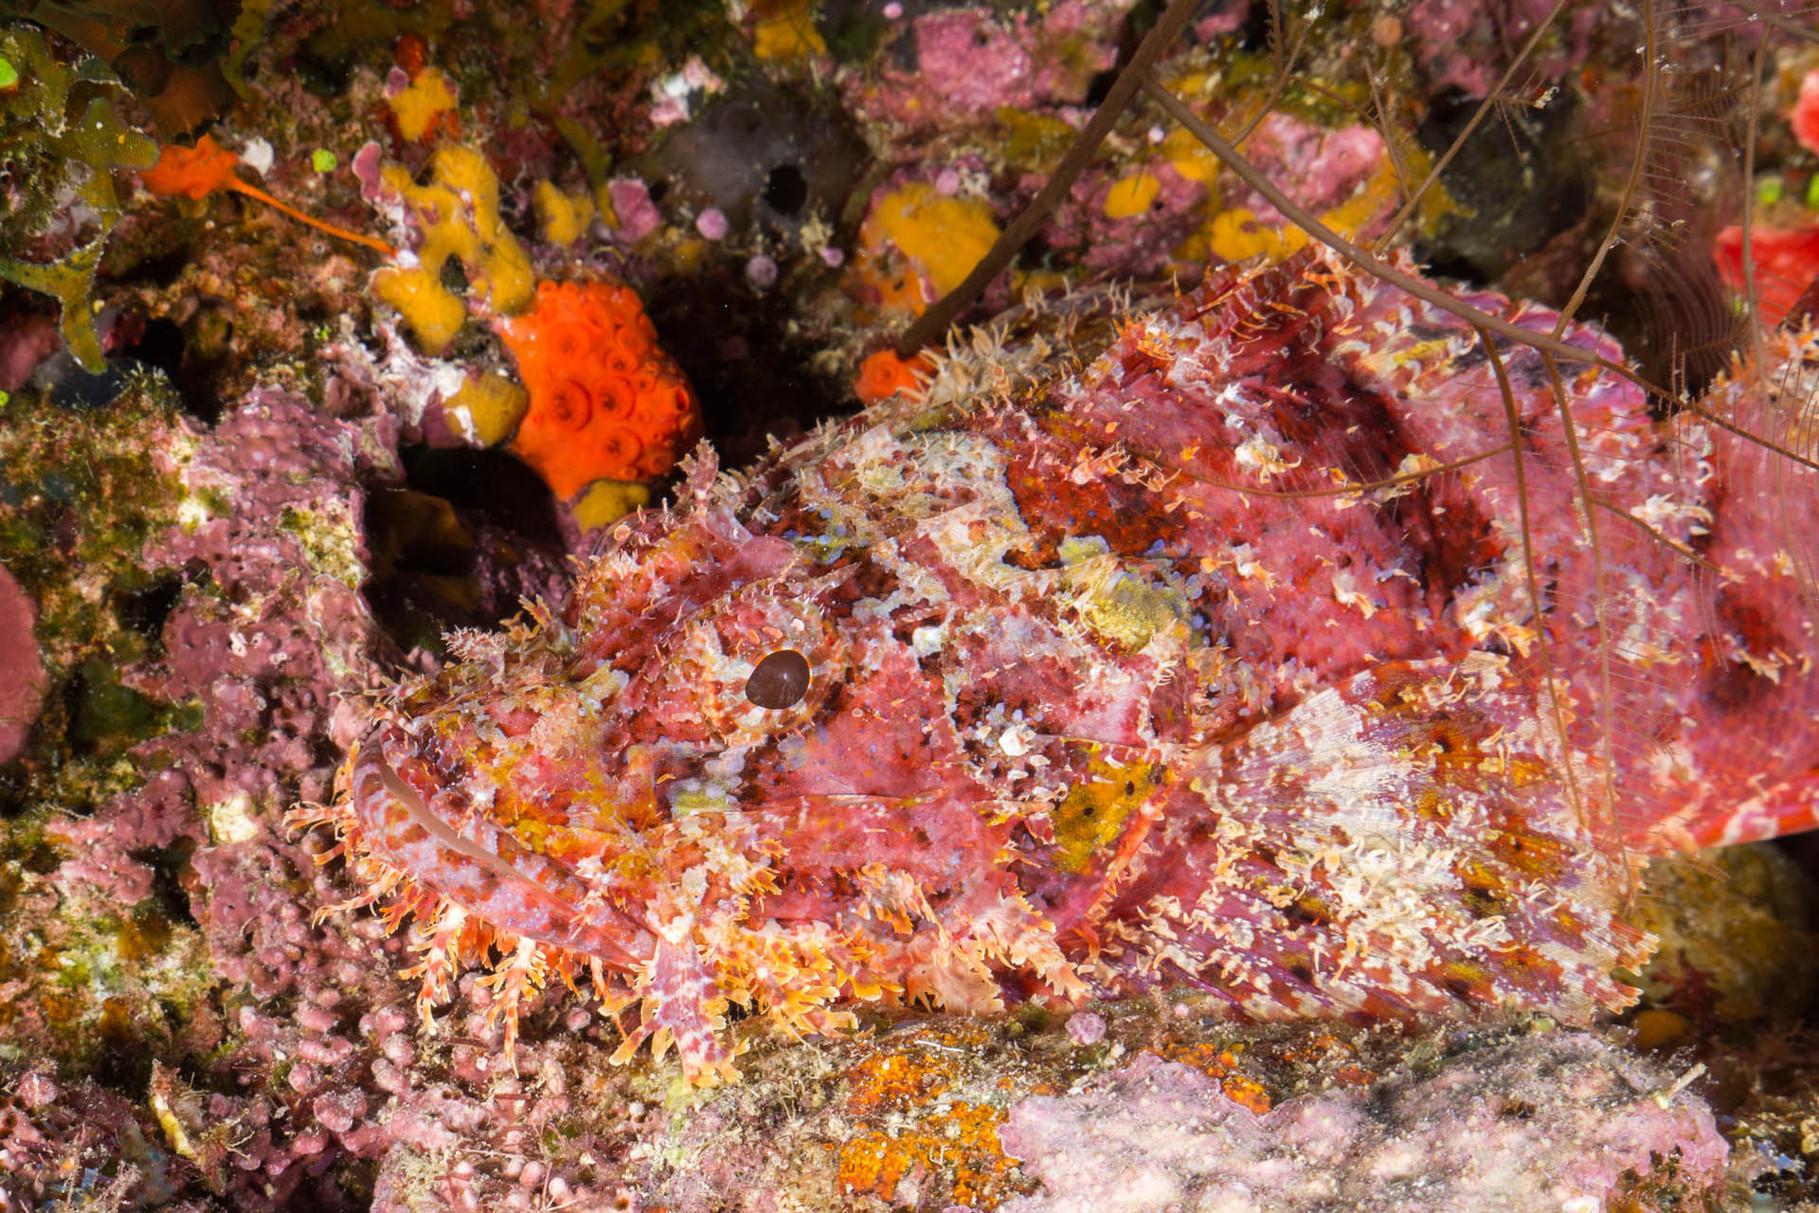 Papuan Scorpionfish (Scorpaenopsis papuensis) [Fiji, 2014]